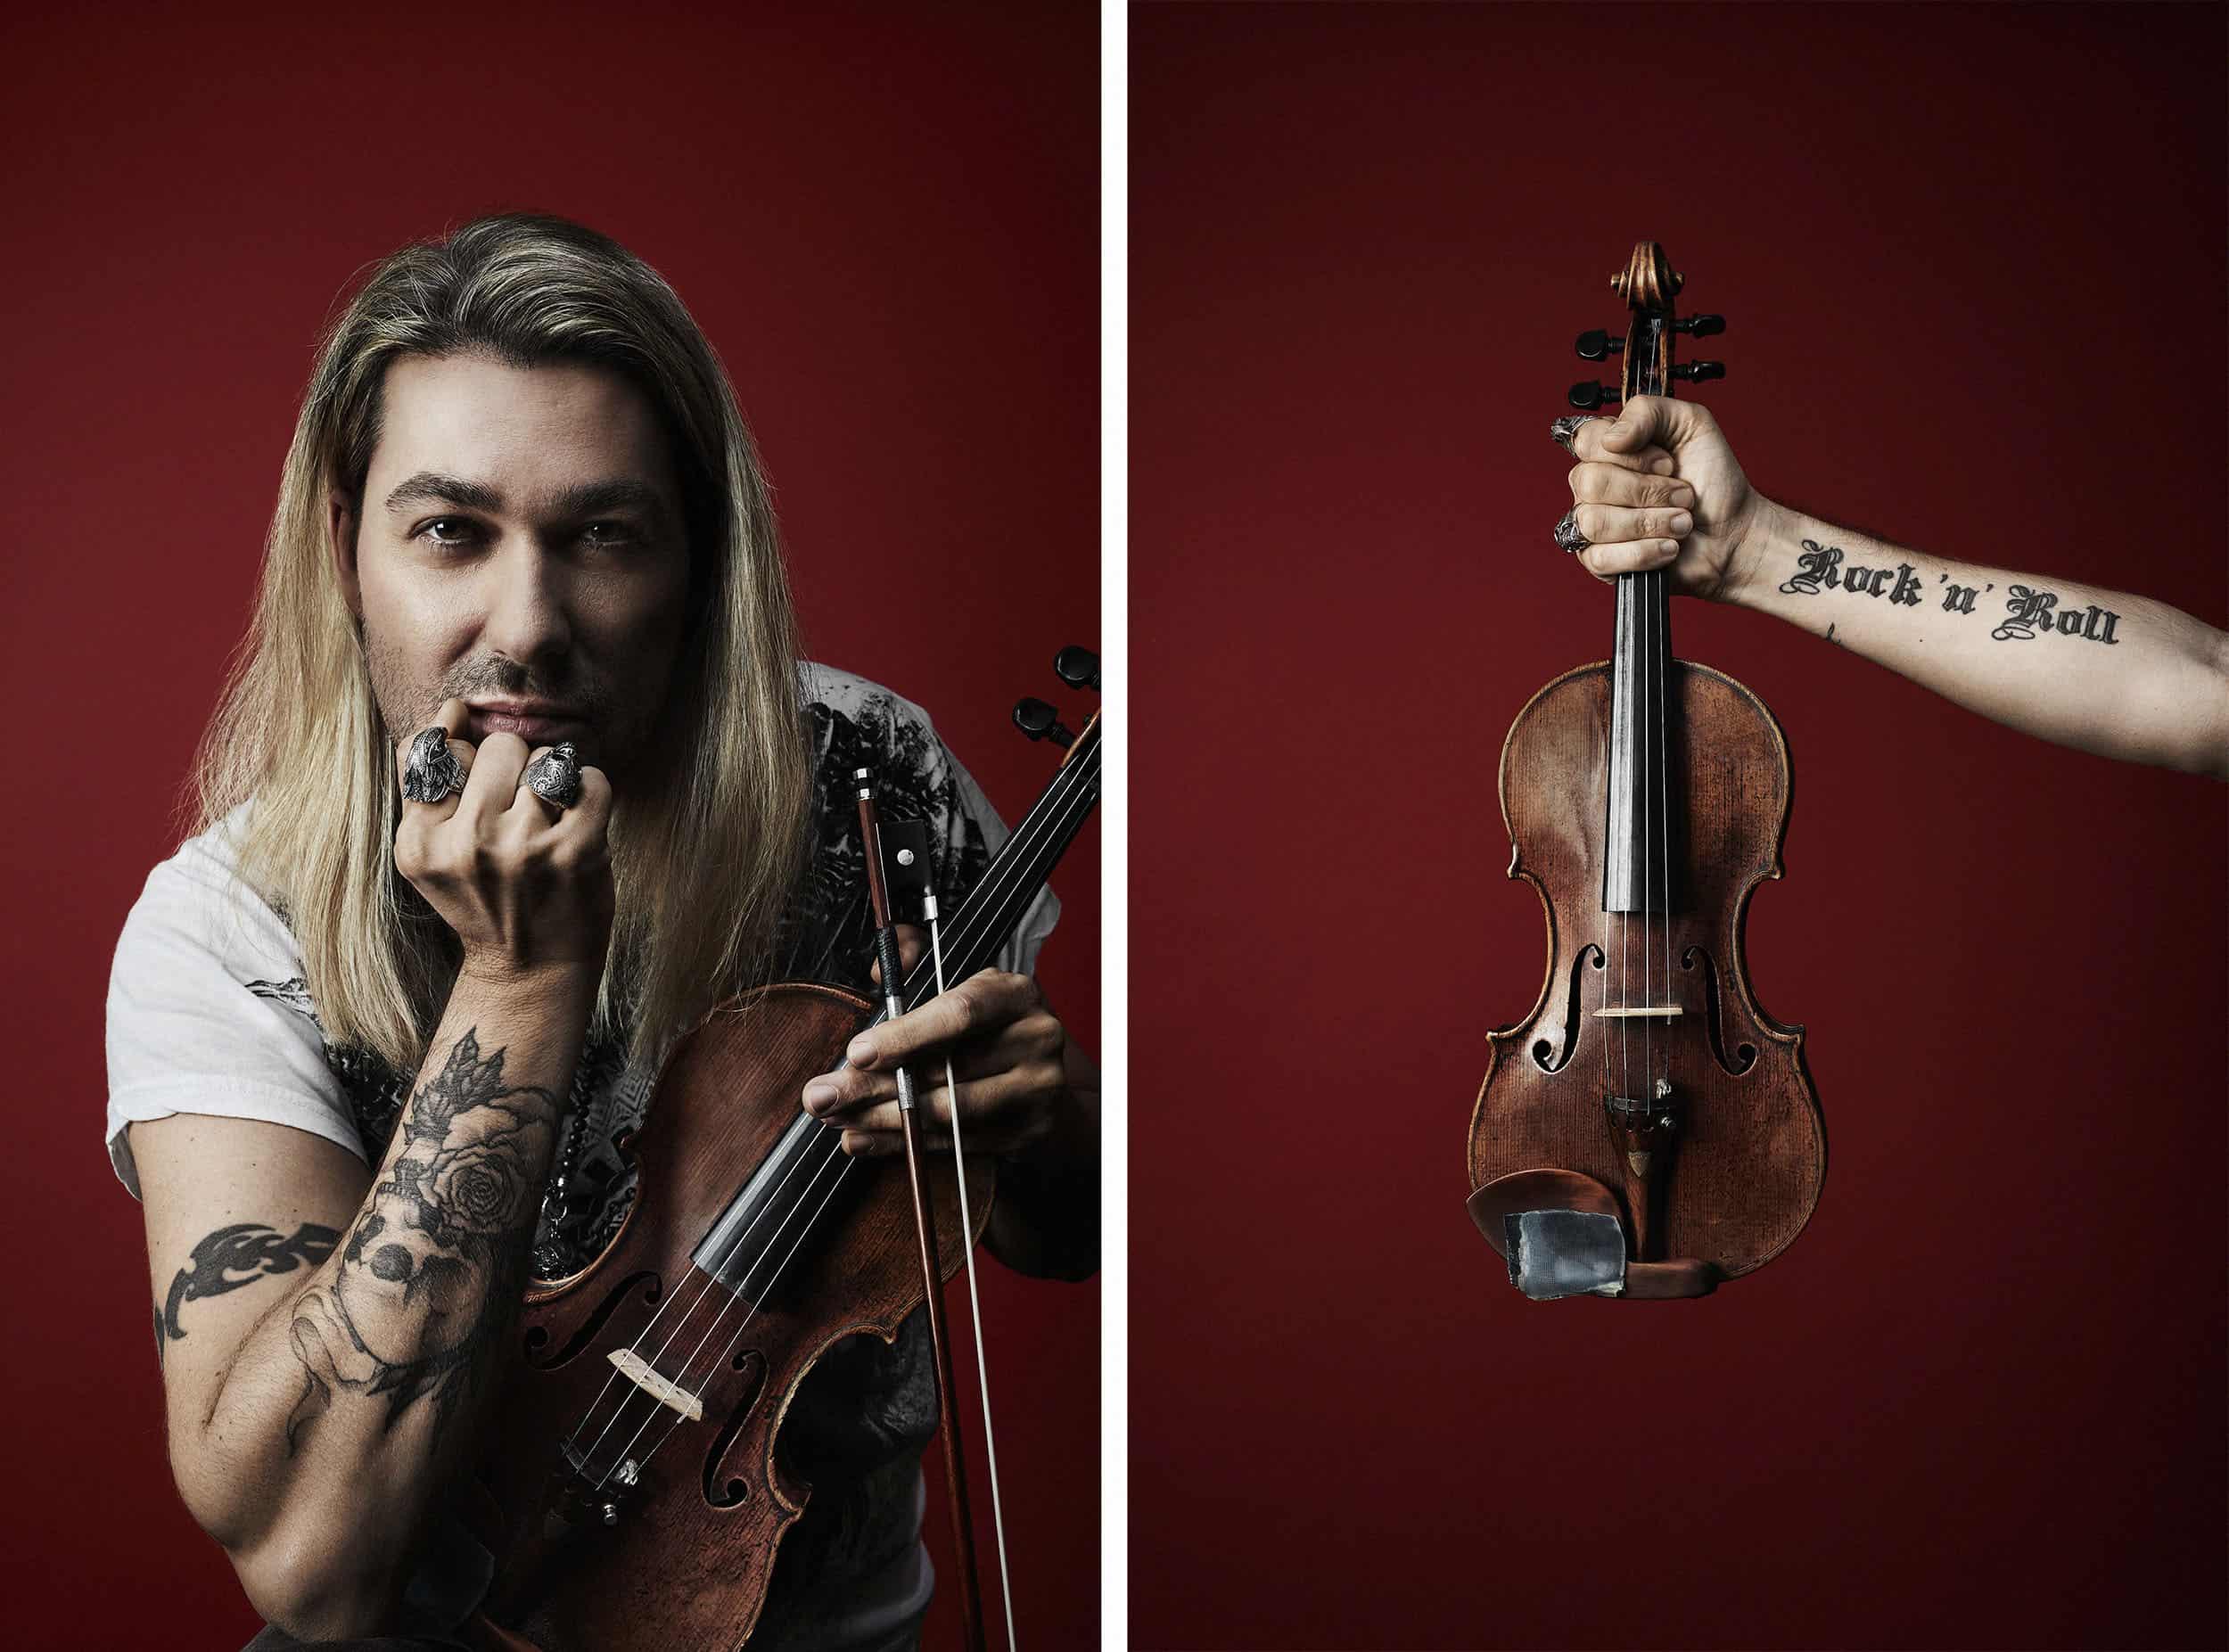 studio-ignatov-musicians-david-garrett-02